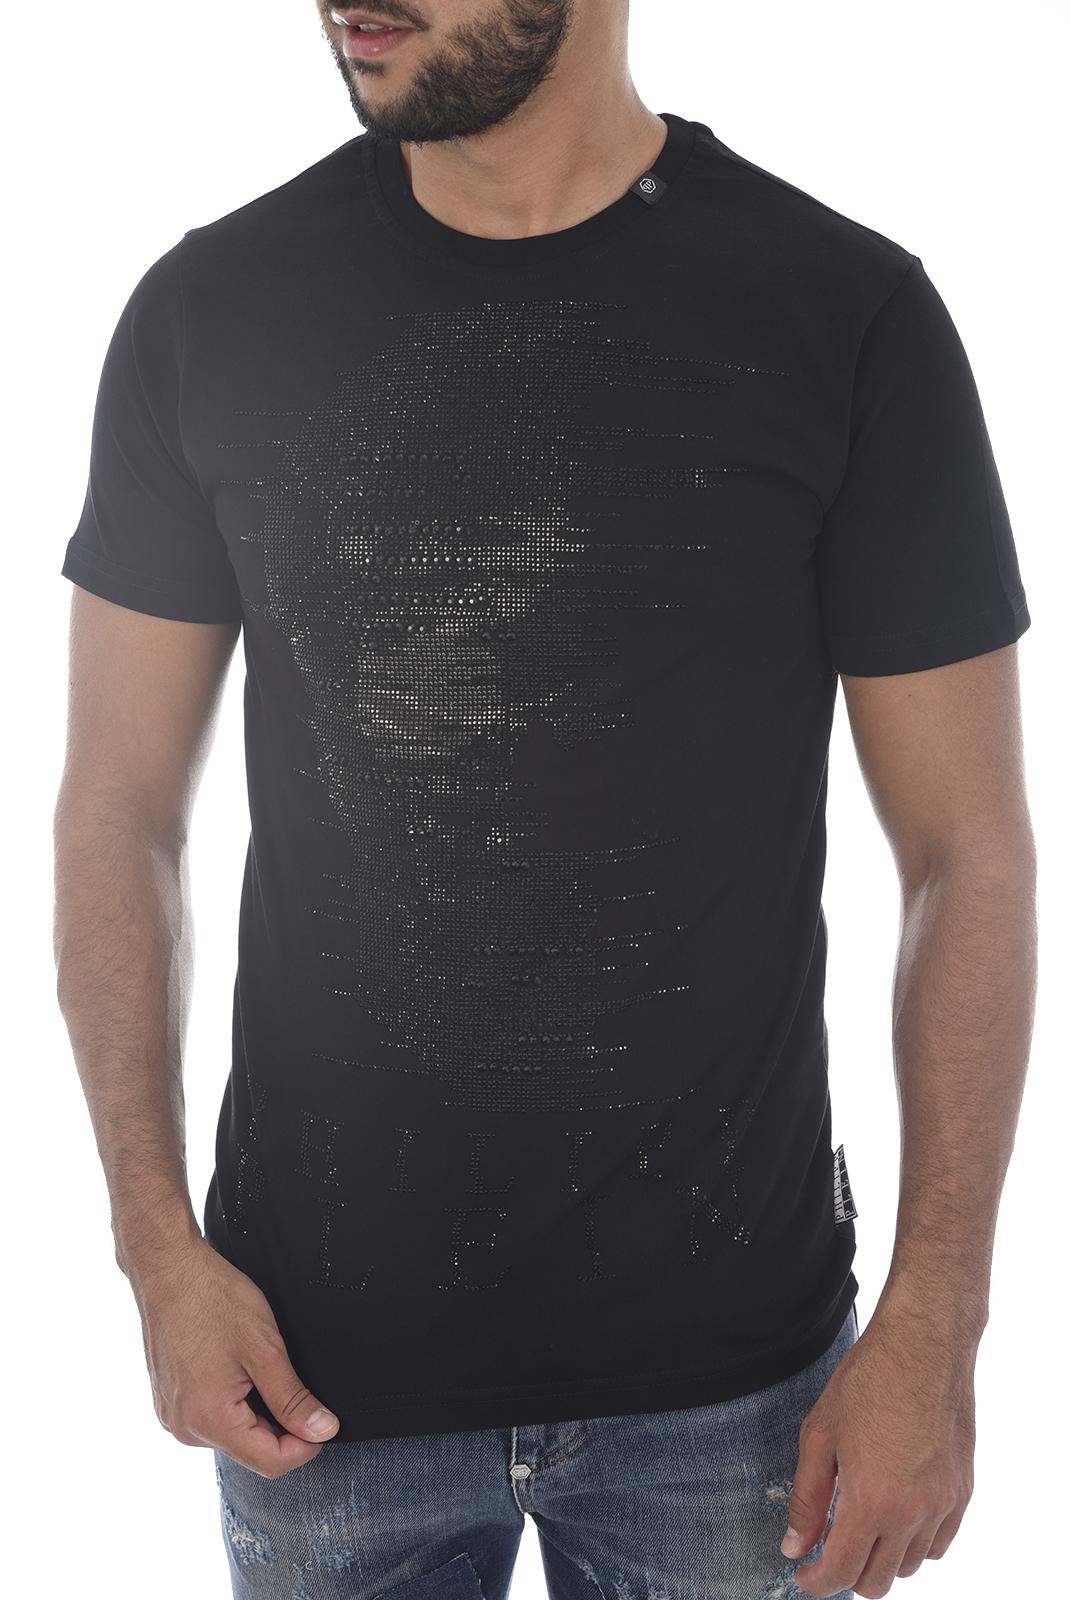 Tee-shirts  Philipp plein MTK1857 GHOST-S 0202 BLACK/BLACK